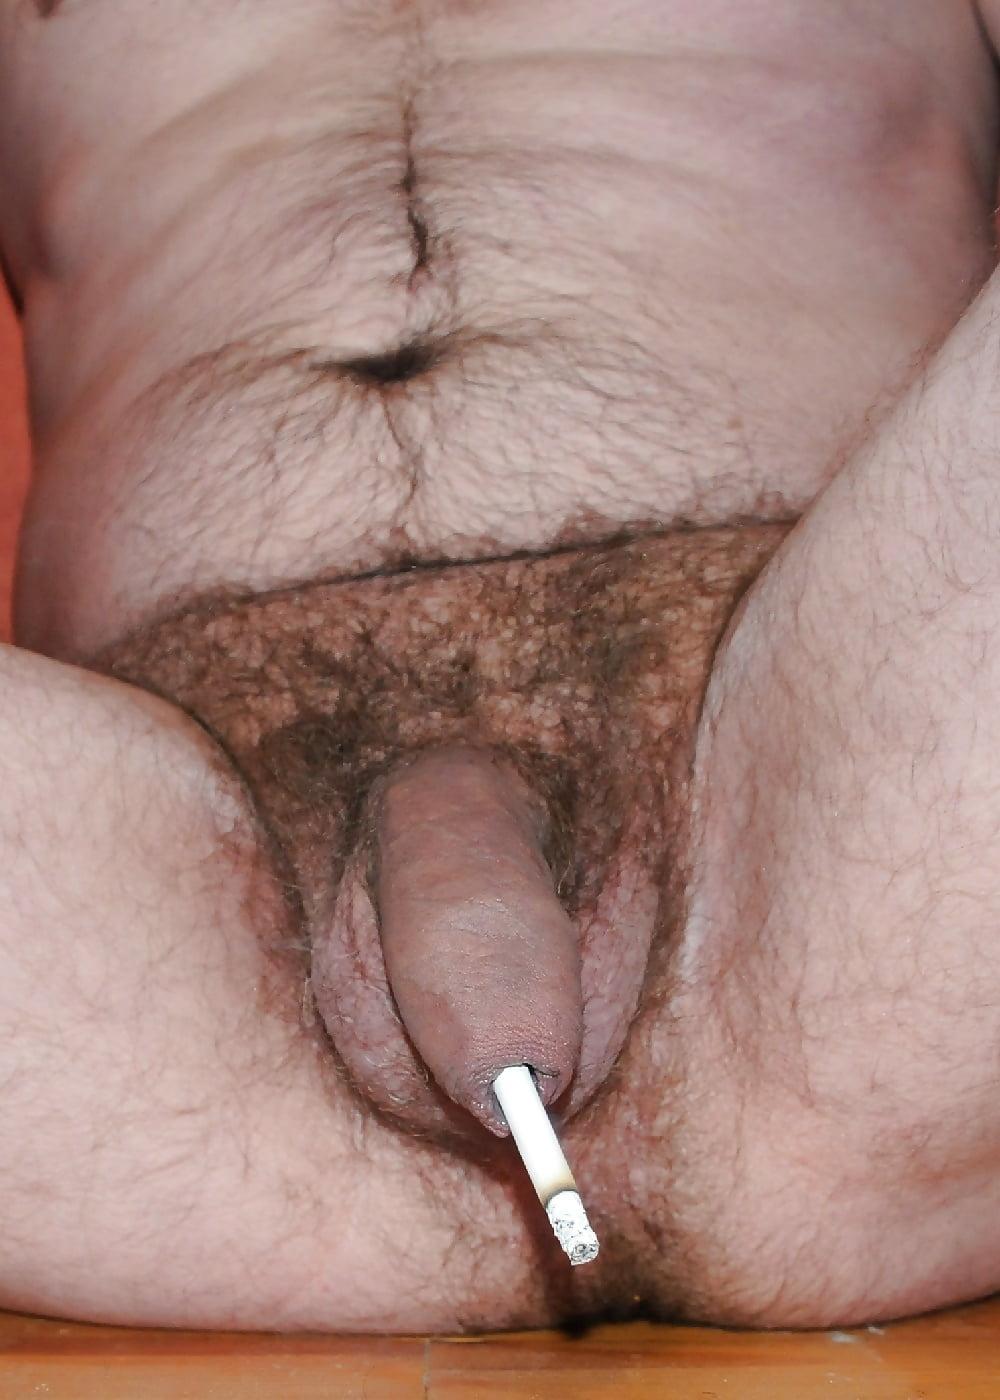 Silicone penis plug vibrator urethral stimulator